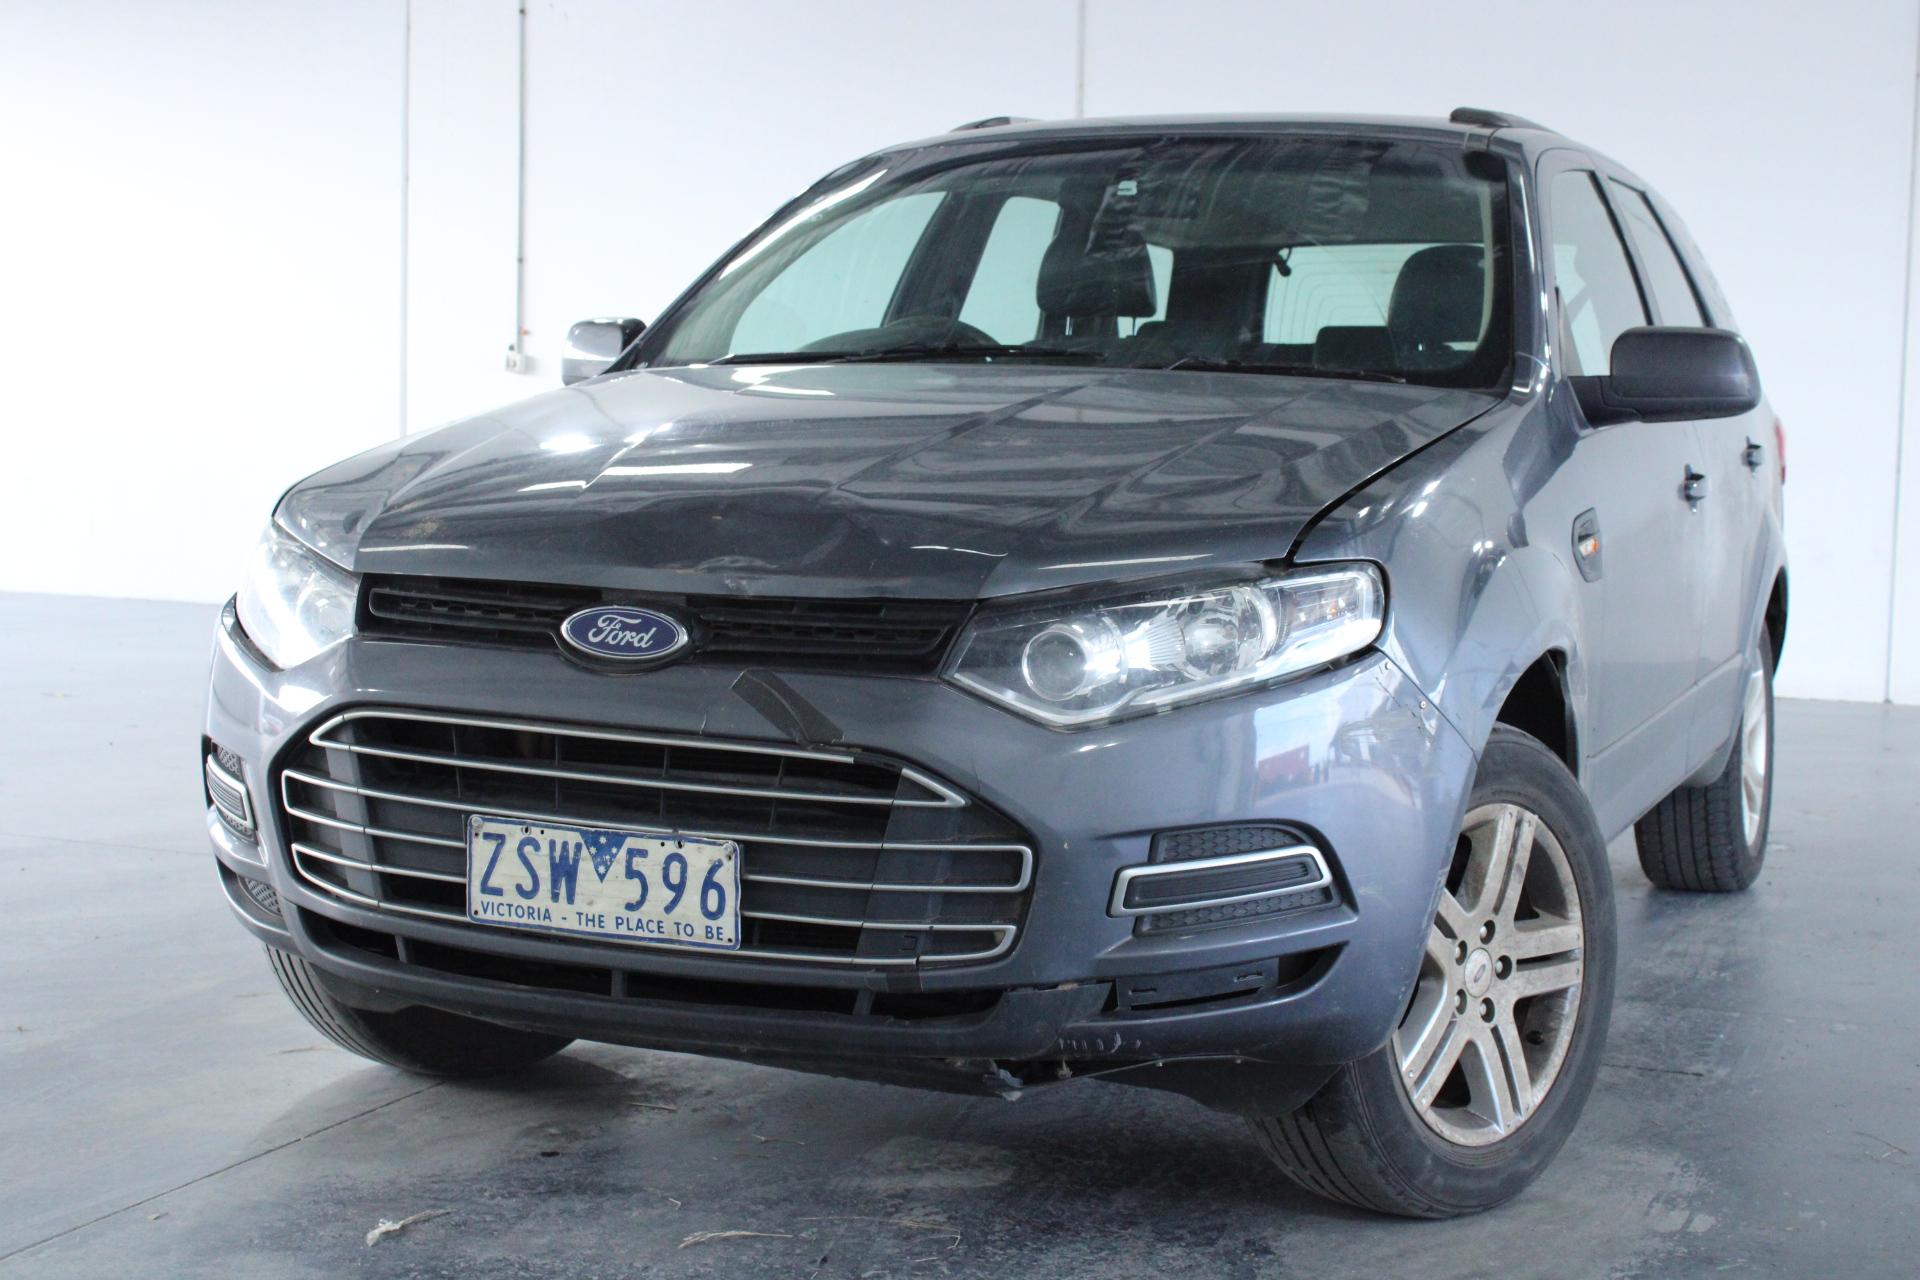 2013 Ford Territory TX (RWD) SZ Automatic 7 Seats Wagon